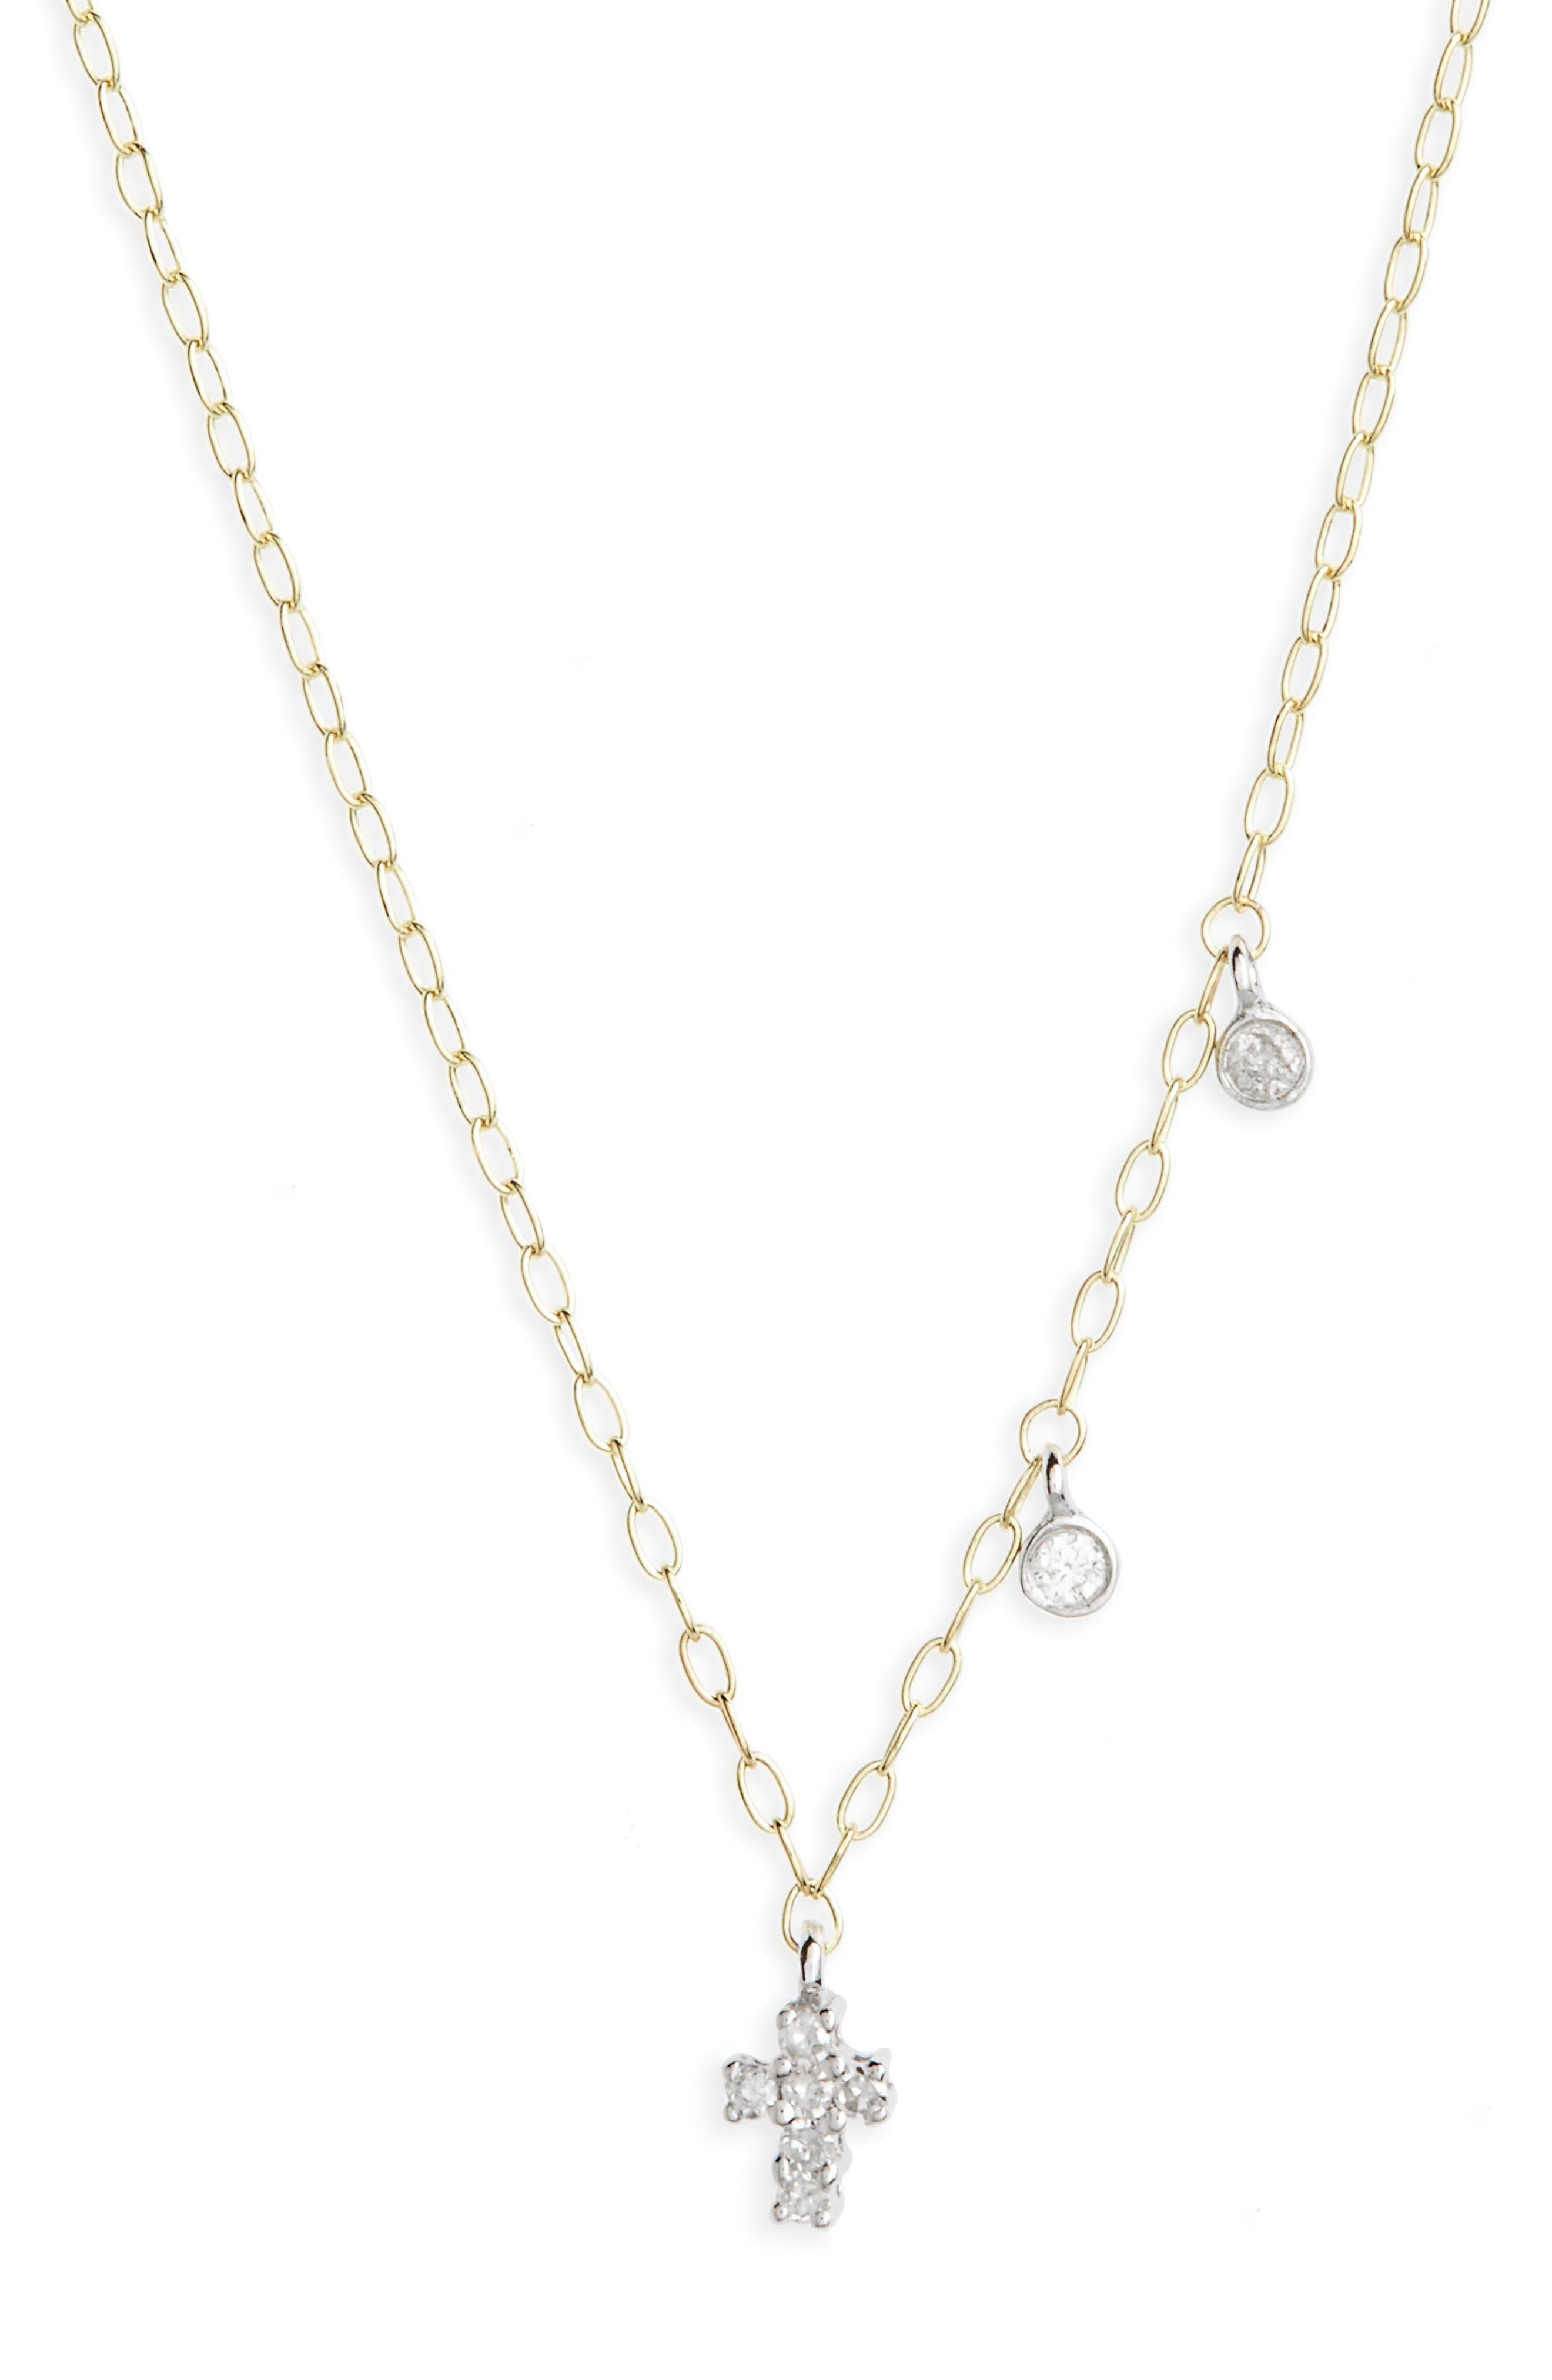 Diamond Cross Pendant Necklace,                         Main,                         color, Yellow Gold/ White Gold